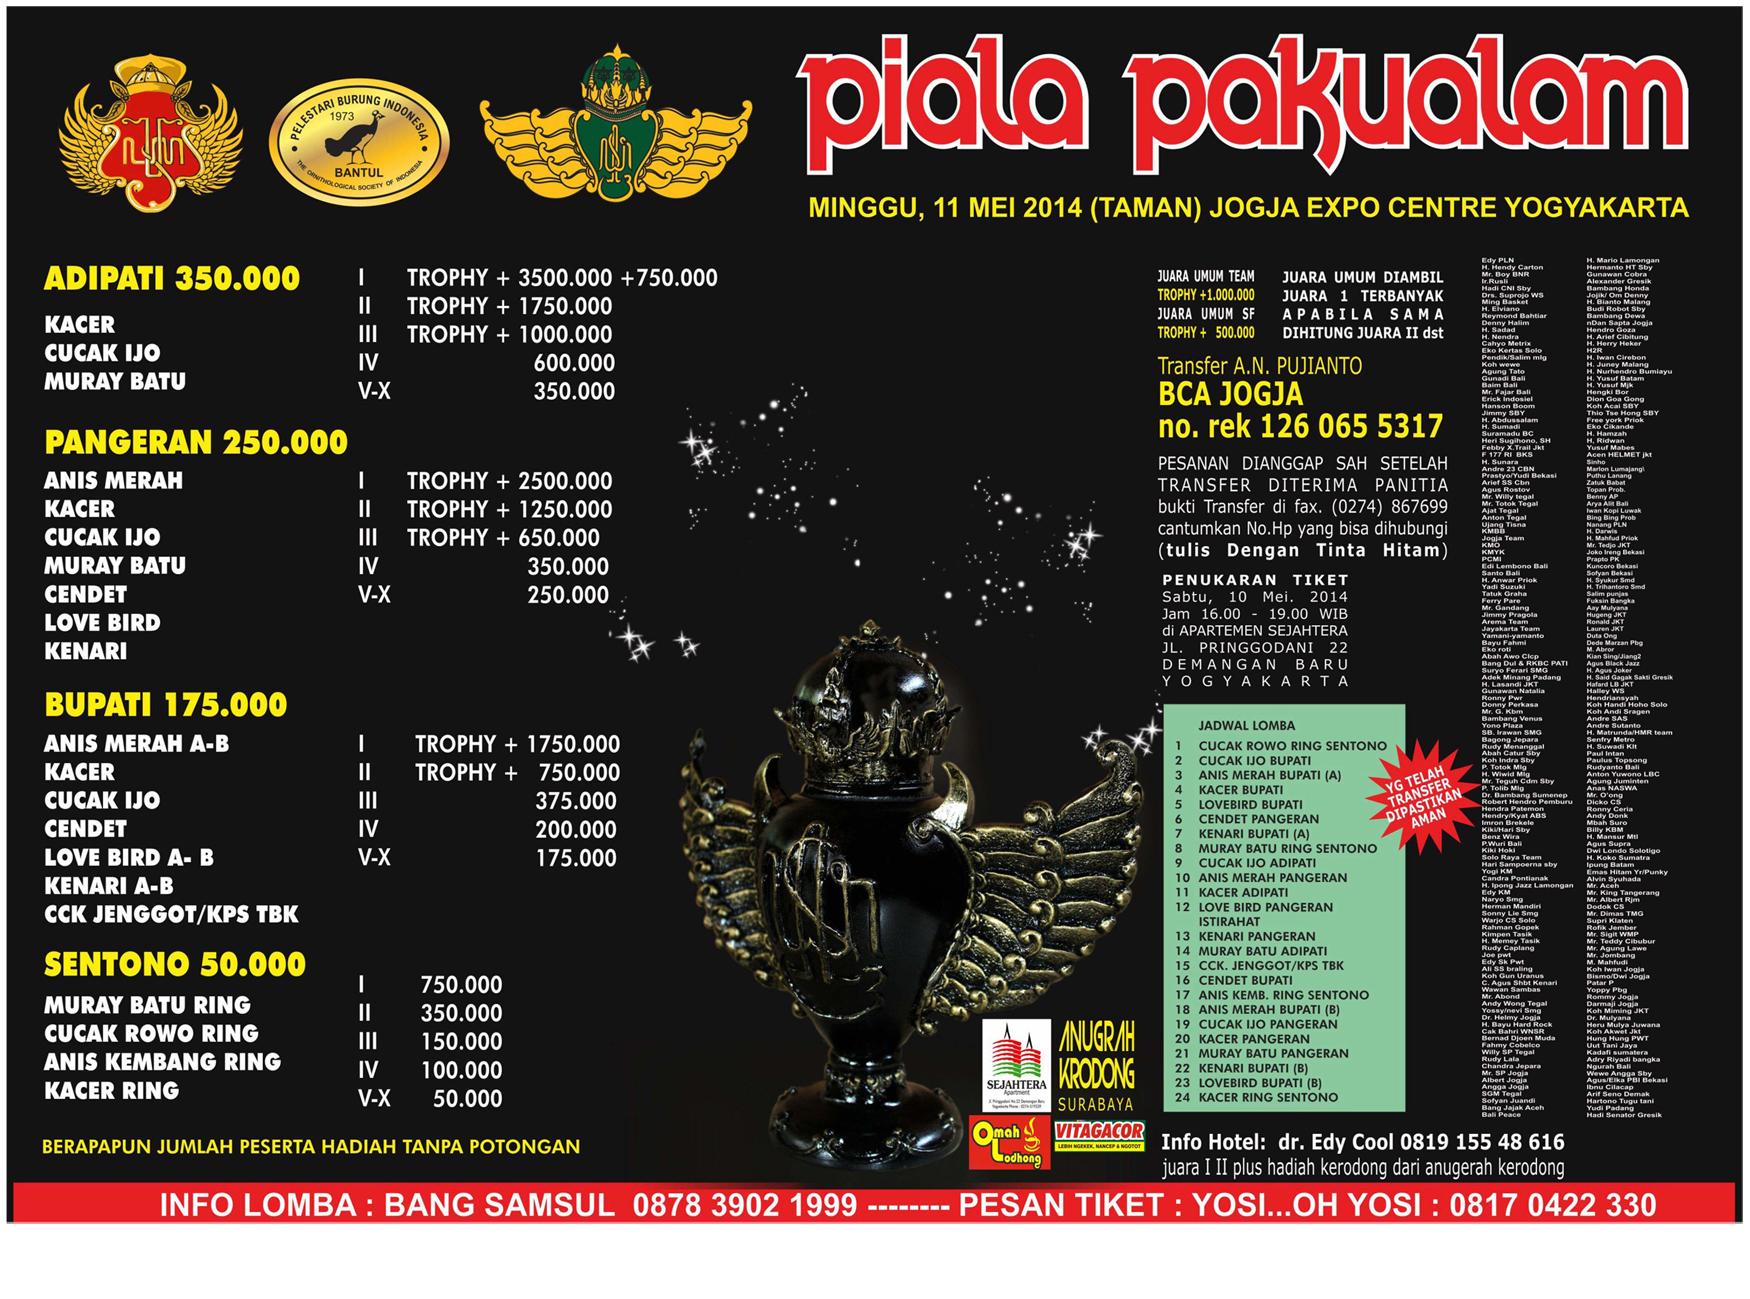 Brosur Lomba Burung Berkicau Piala Pakualam, Jogja, 11 Mei 2014